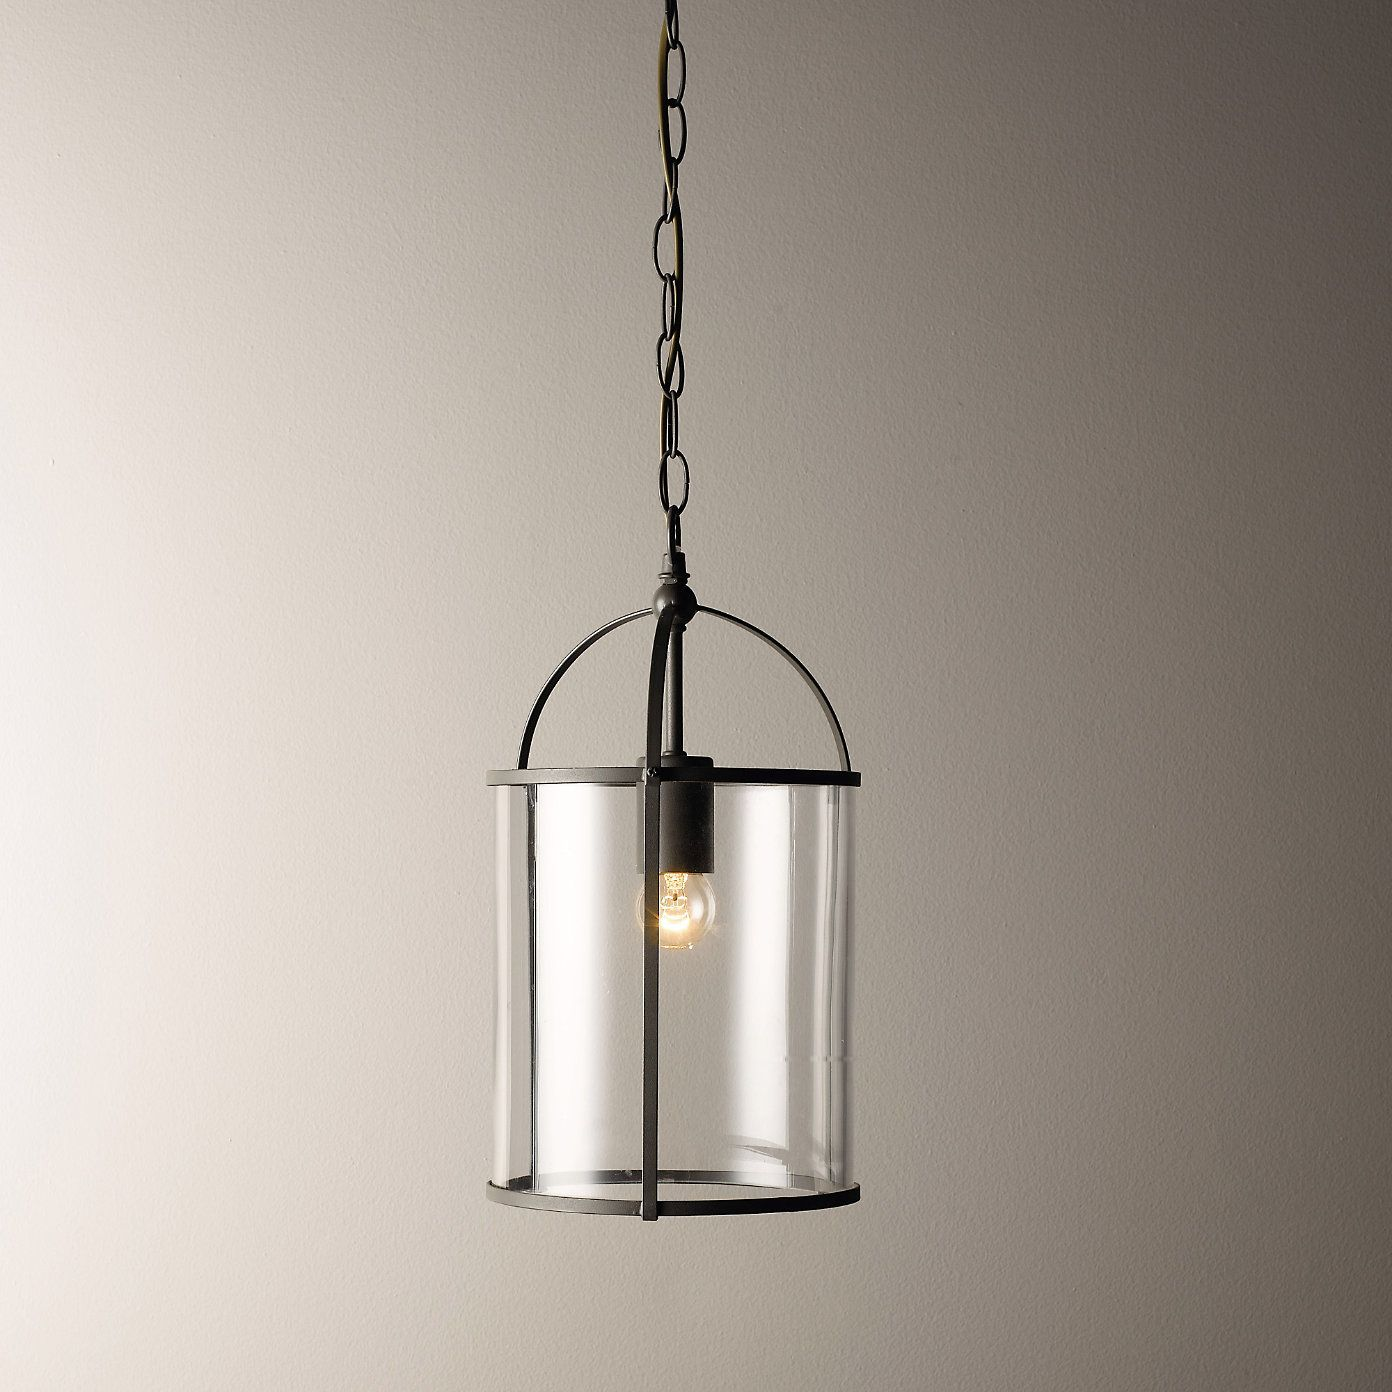 Lantern Ceiling Light   The White Company   Pendant ...